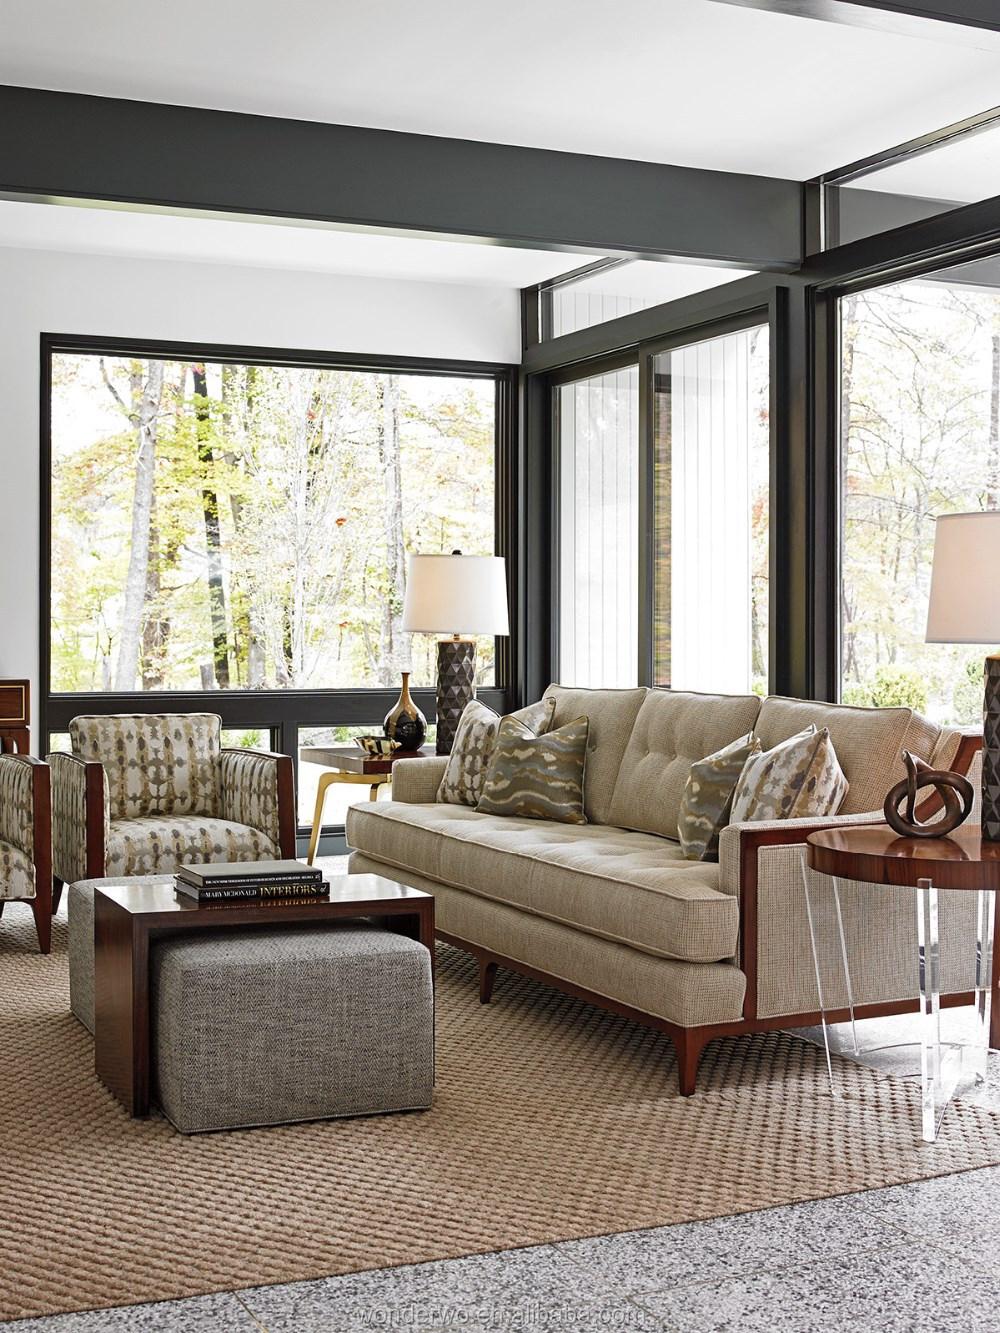 tufted living room furniture. Barclay Sofa wood trimmed sofa button tufted living room furniture hotel